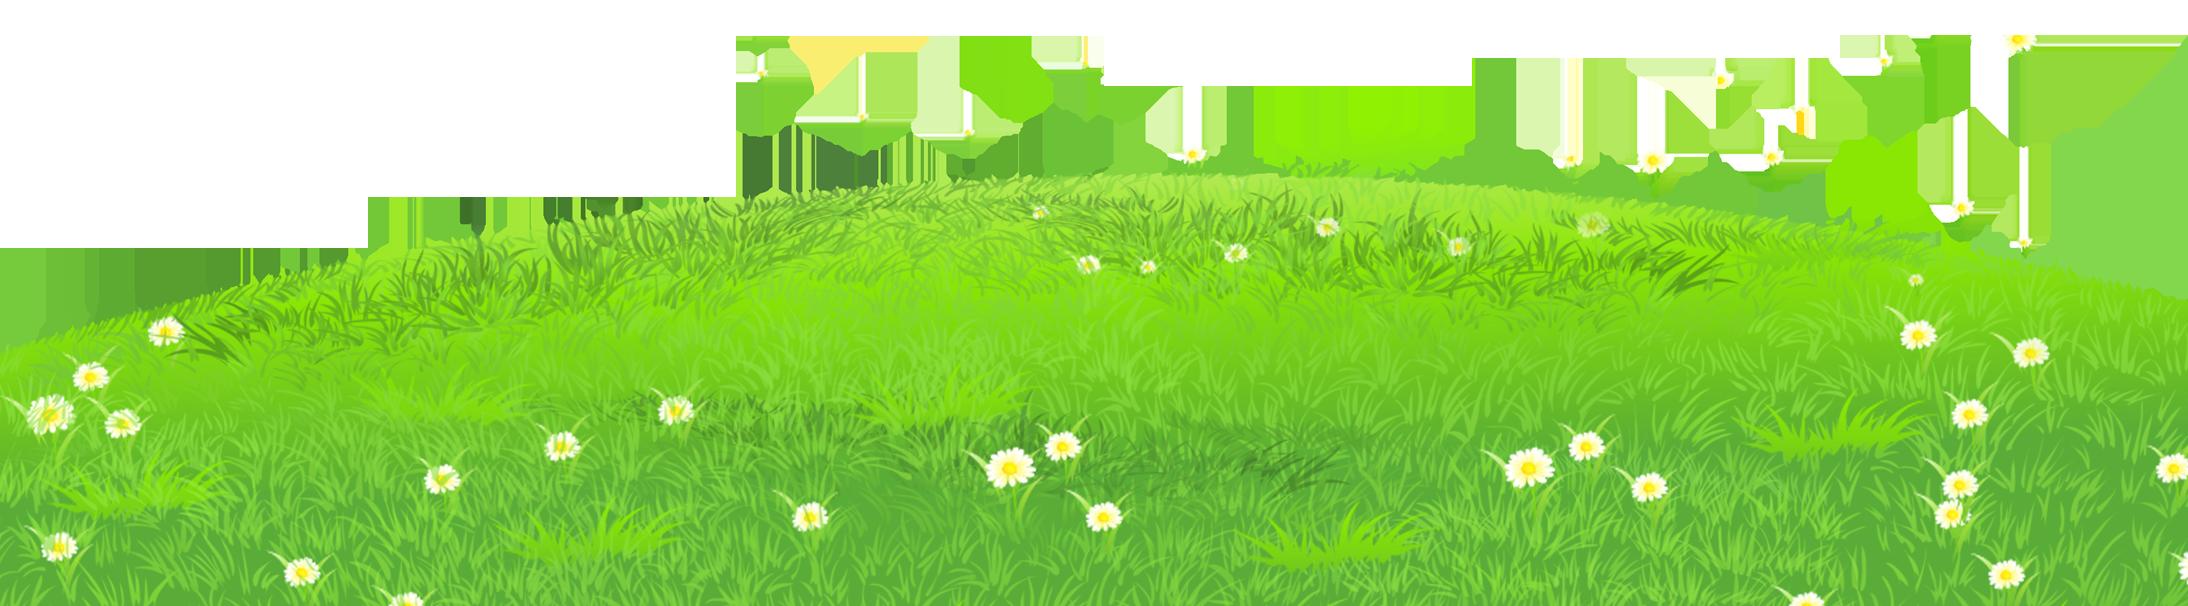 Hills clipart patch grass, Picture #1338886 hills clipart.